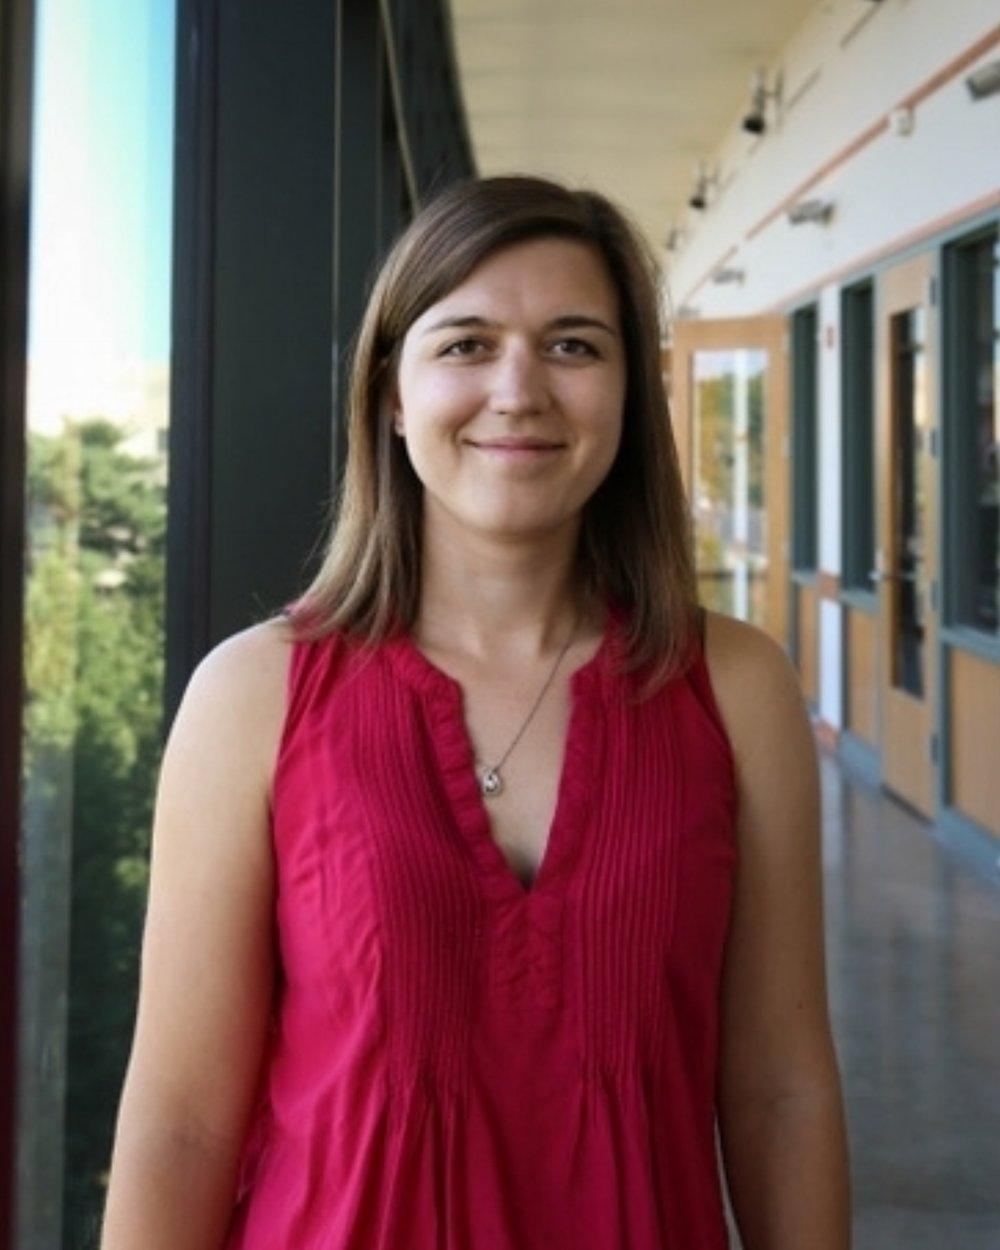 Molly Baker    PhD candidate in biomedical engineering   Salary negotiation workshop organizer